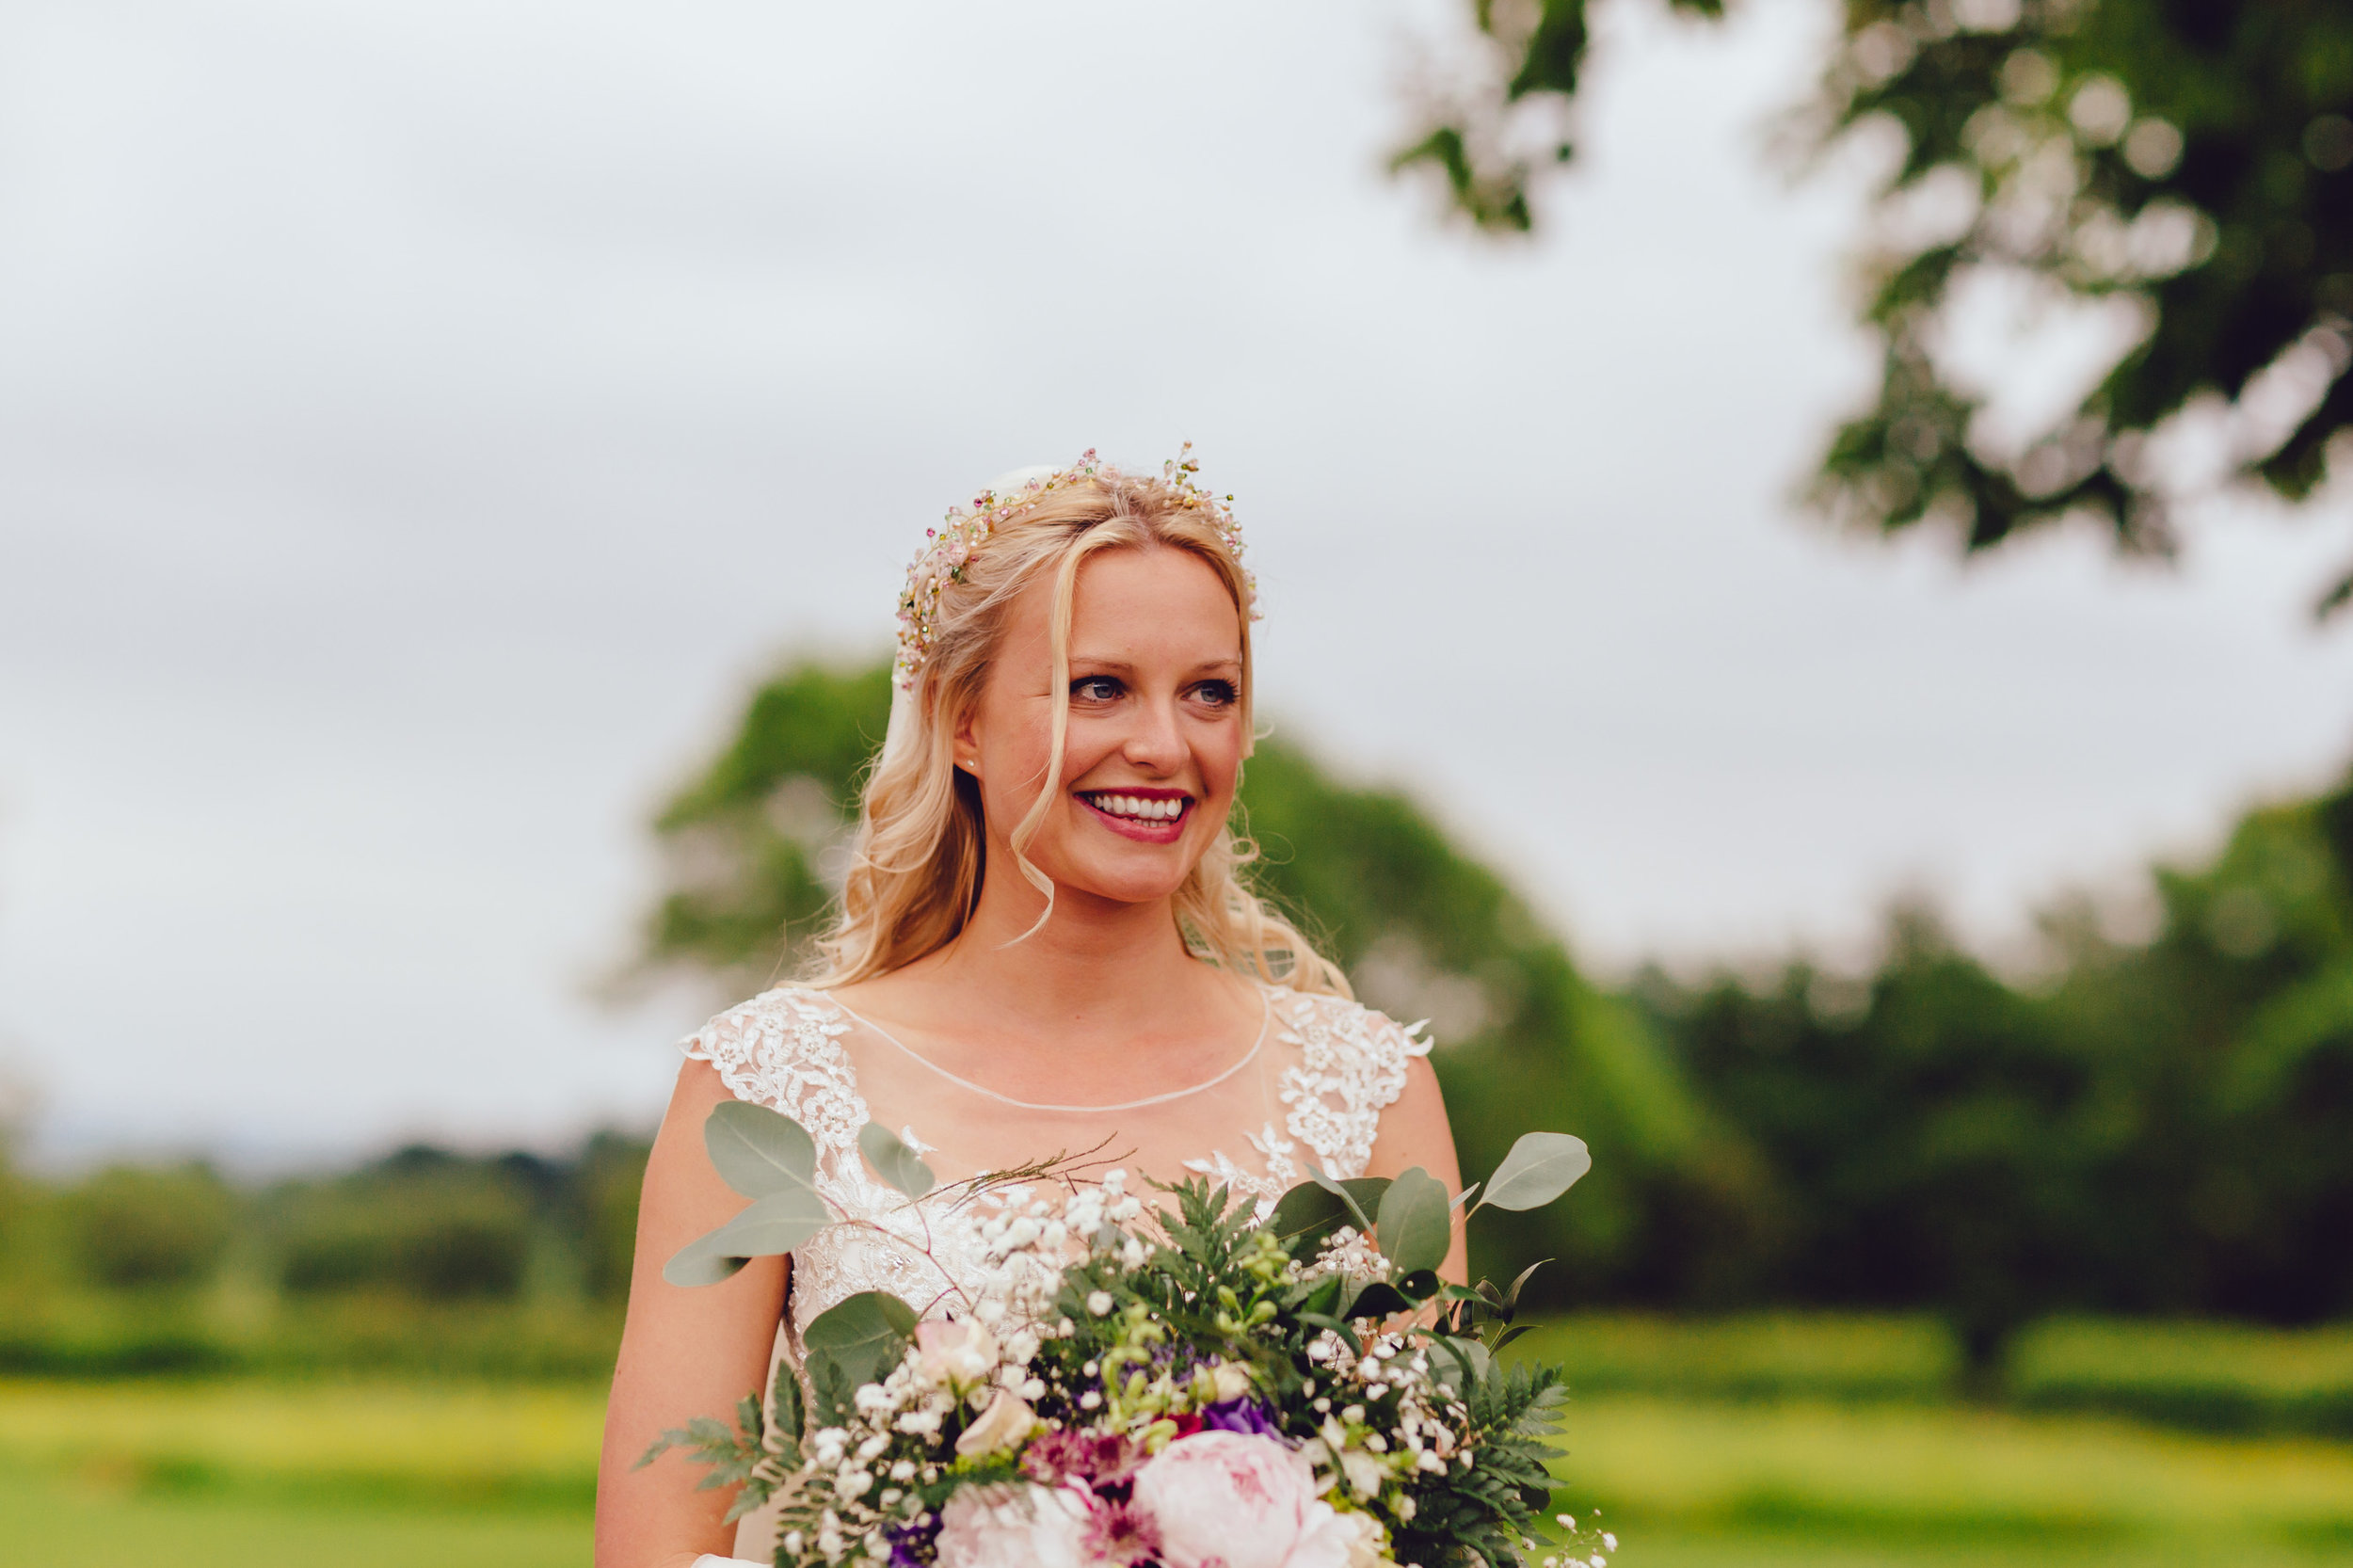 Birmingham photographer wedding country artistic wedding photography05.jpg